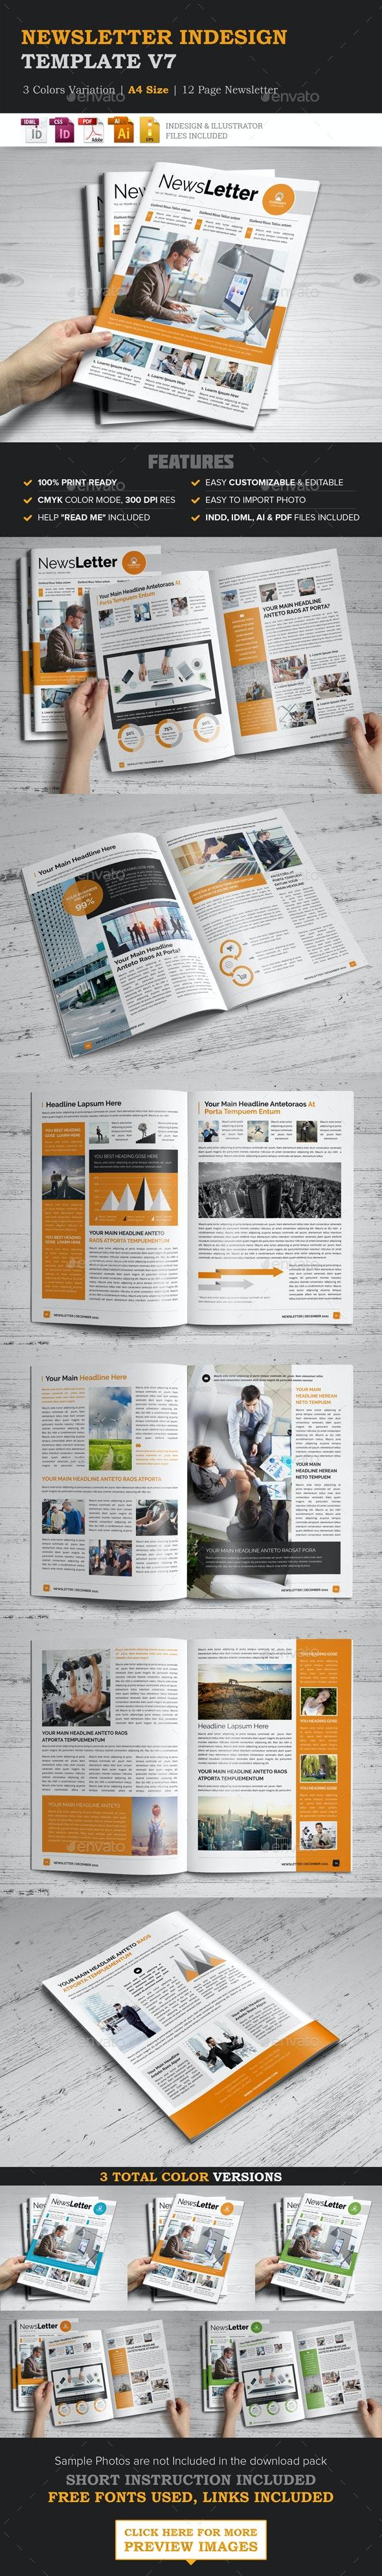 Newsletter Indesign Template v7 - Newsletters Print Templates